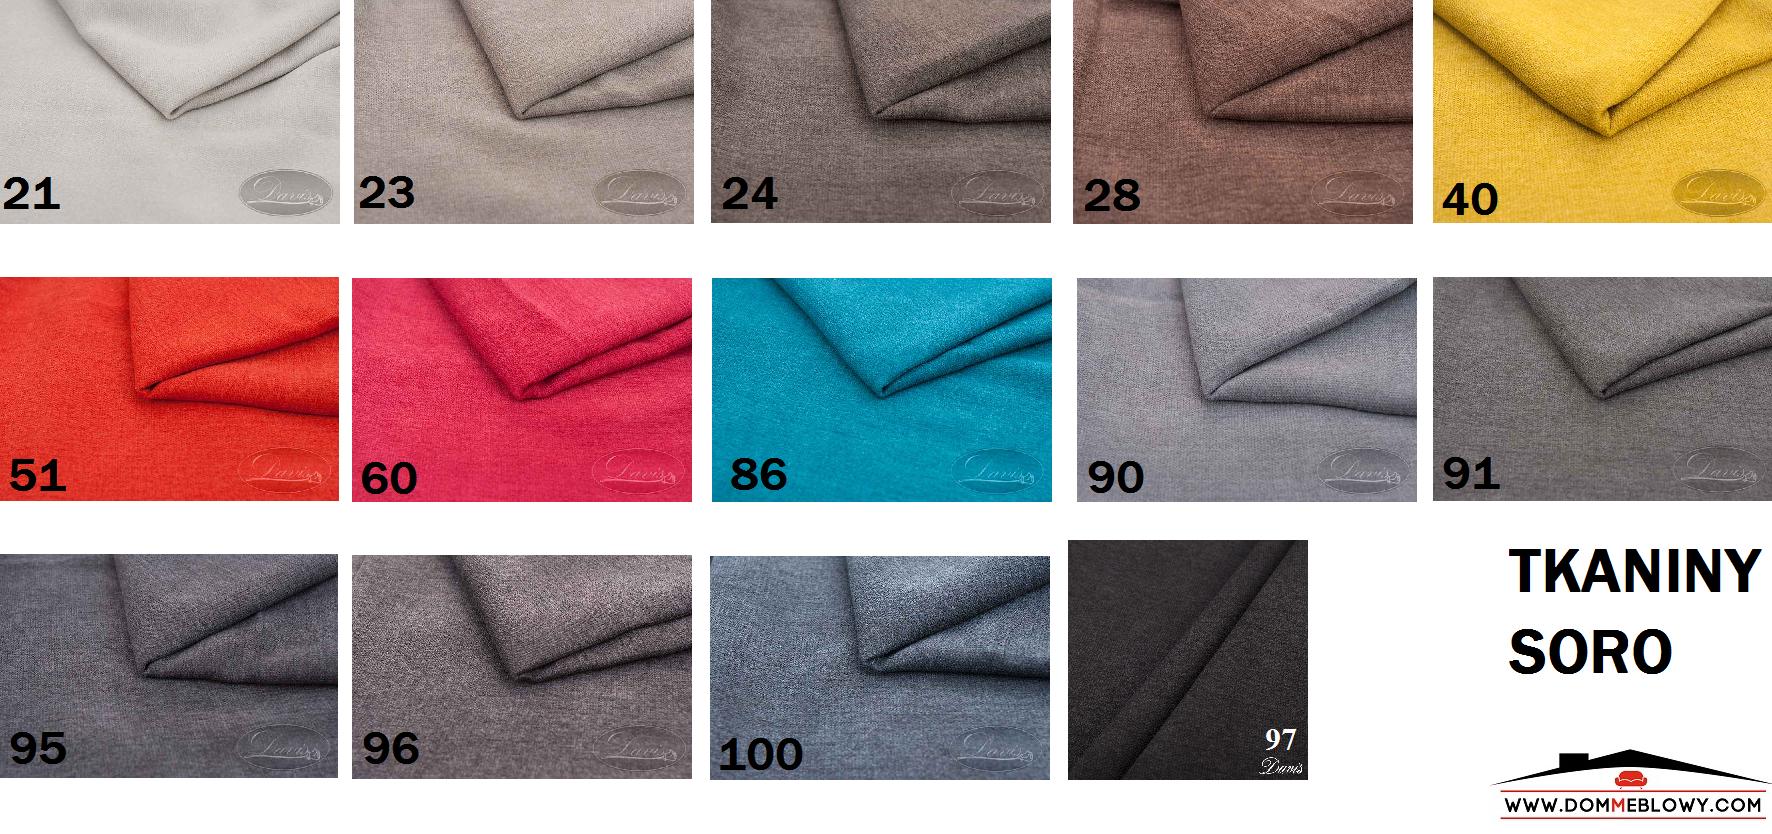 Tkaniny Soro dla mebli tapicerowanych producenta Meblosoft